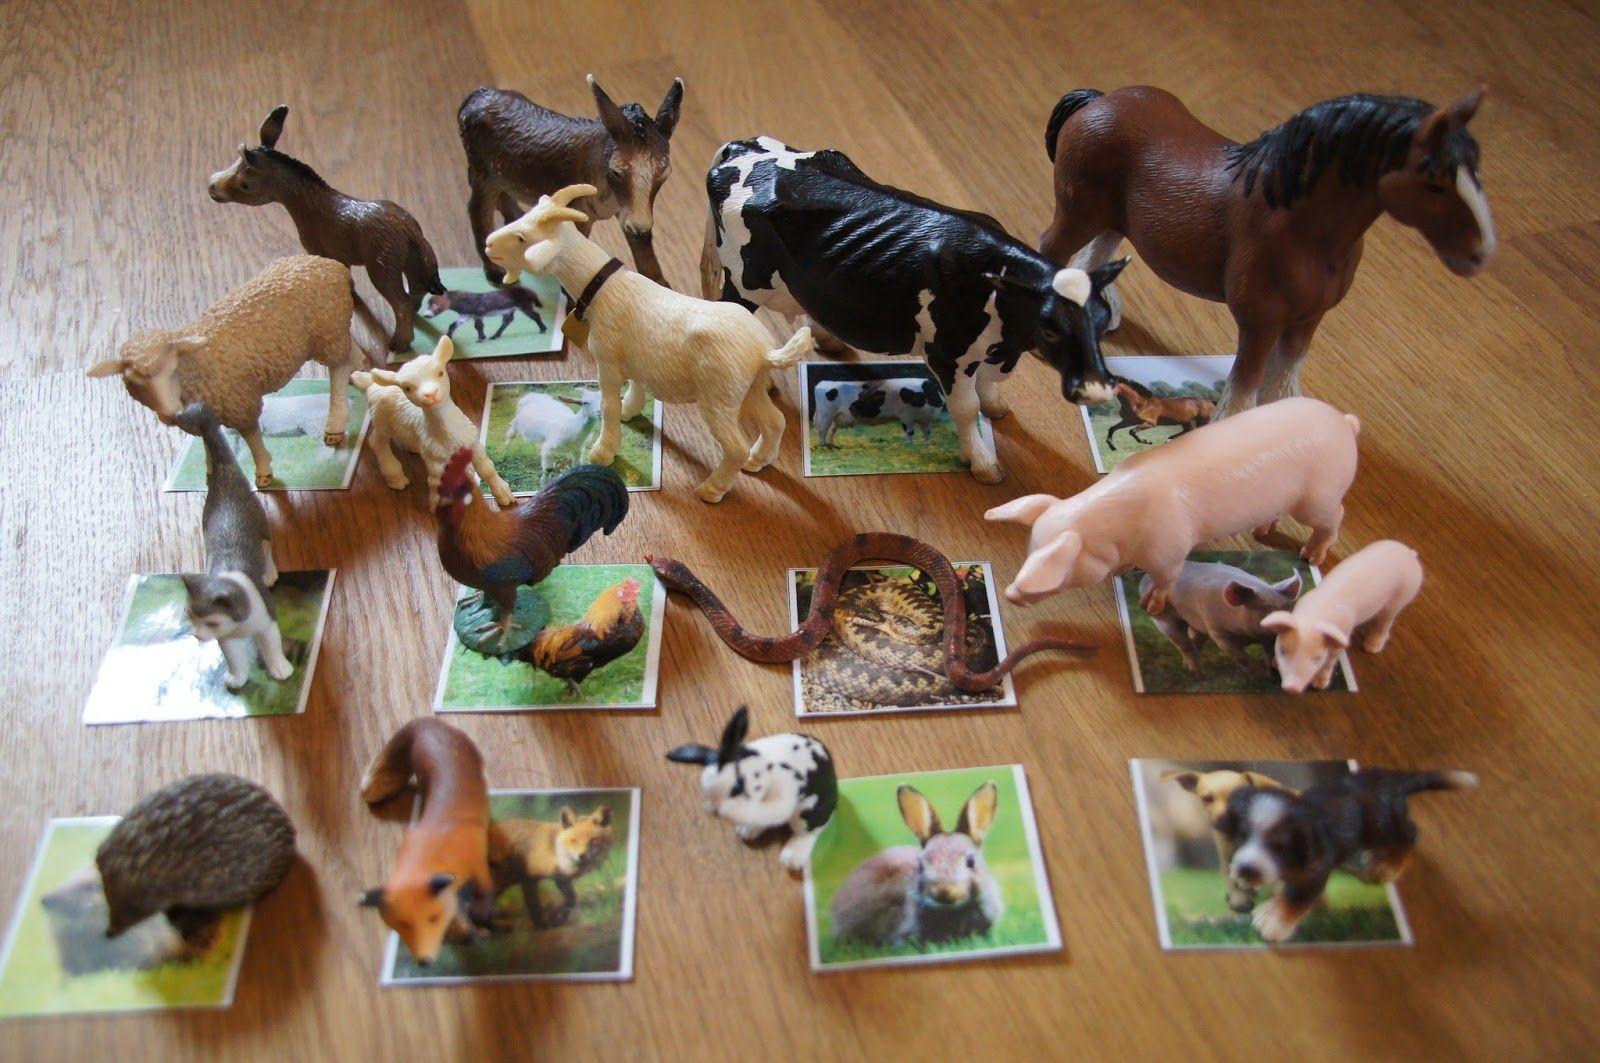 Tier Spiele FГјr Kinder